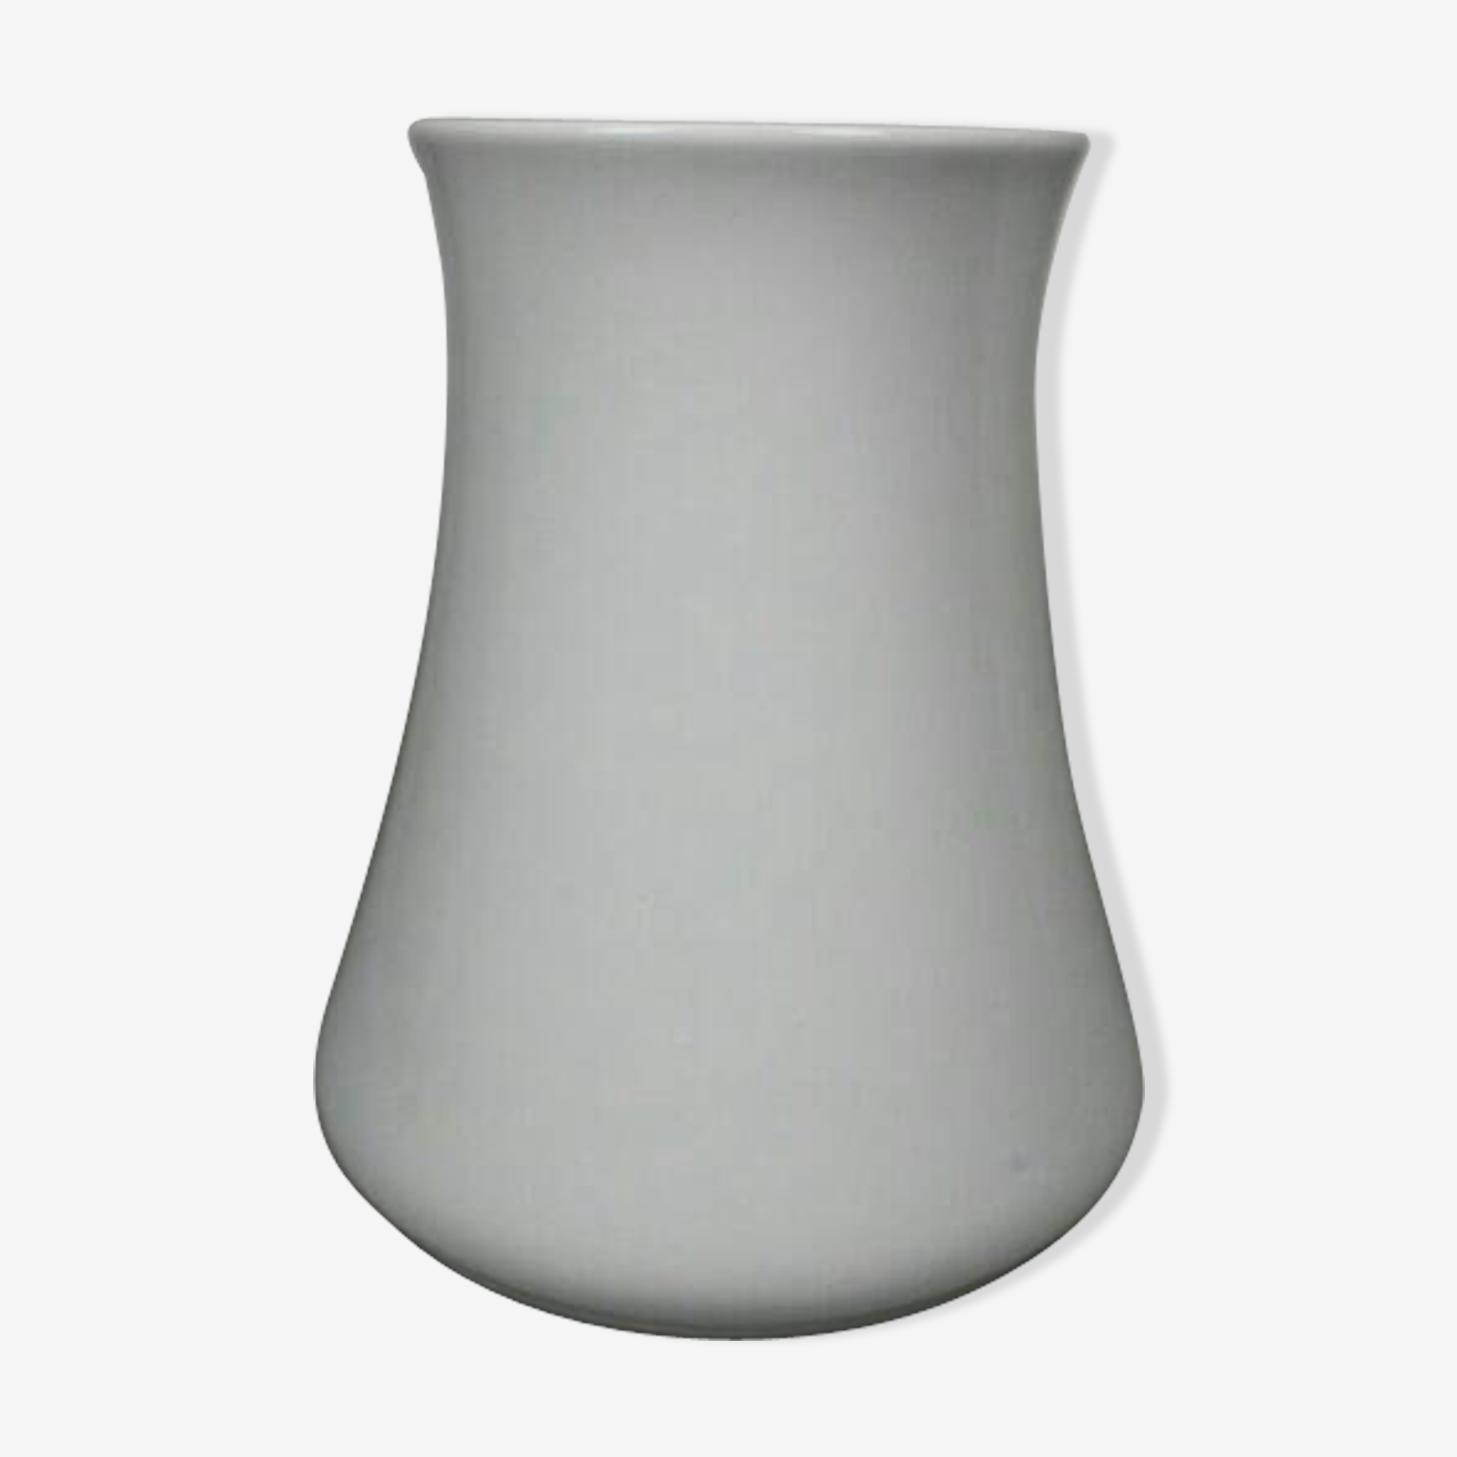 Vase designed by Marcel Wanders for Rosenthal Dutch 90's